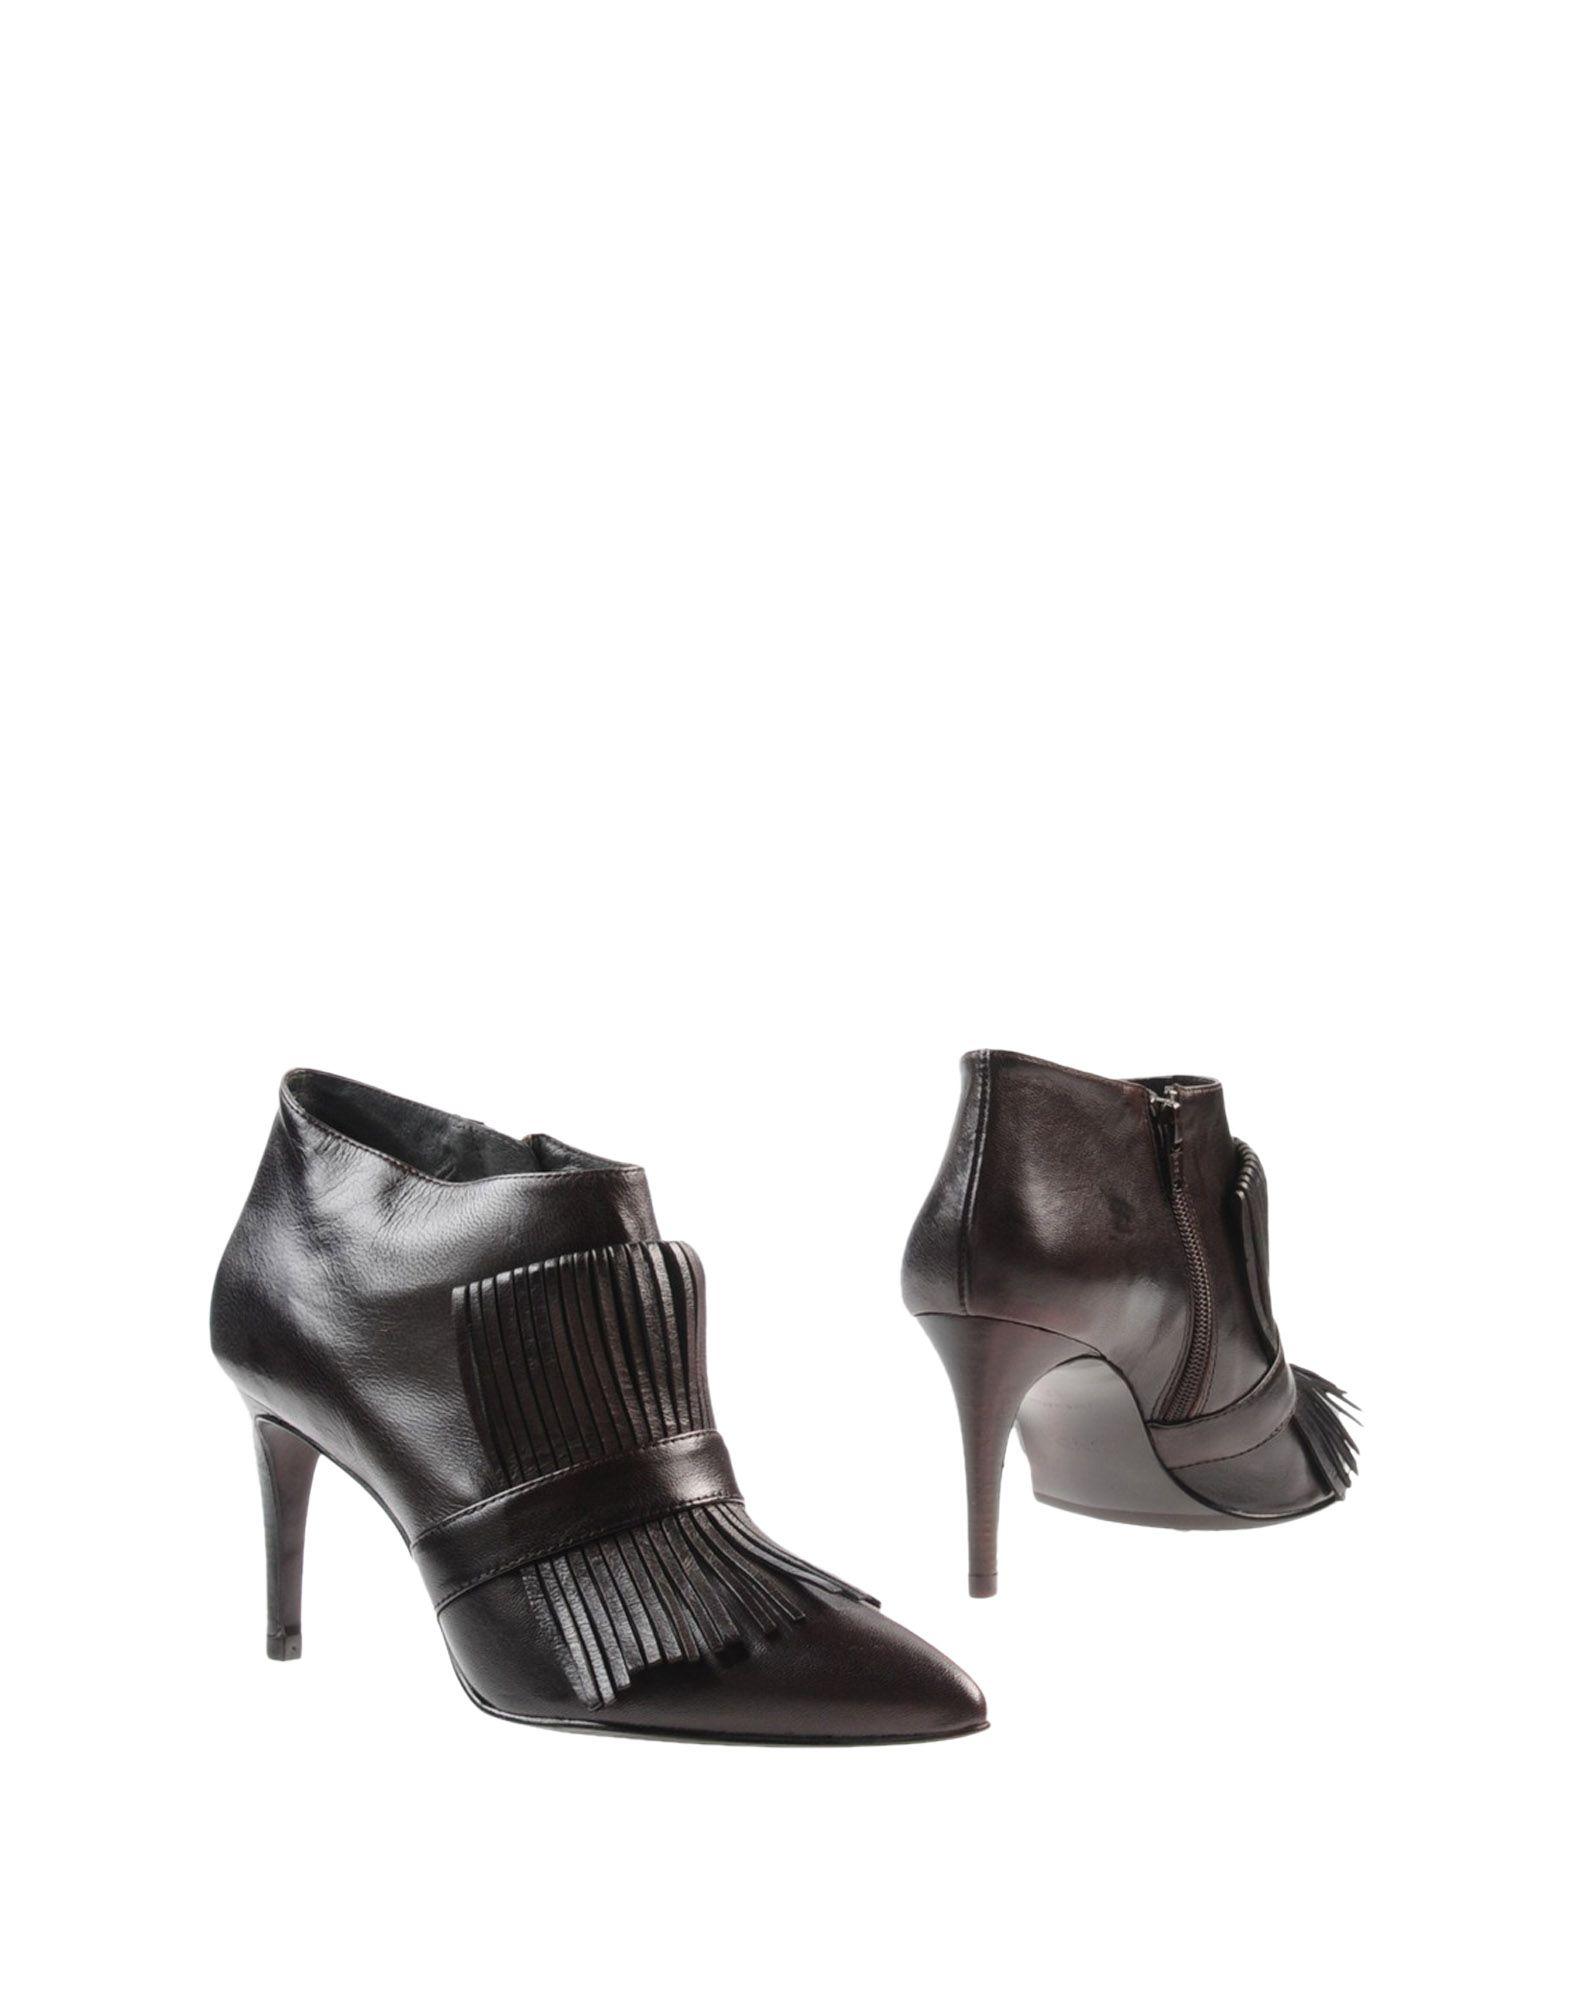 Zinda 11307663JI Stiefelette Damen 11307663JI Zinda Gute Qualität beliebte Schuhe e64d43